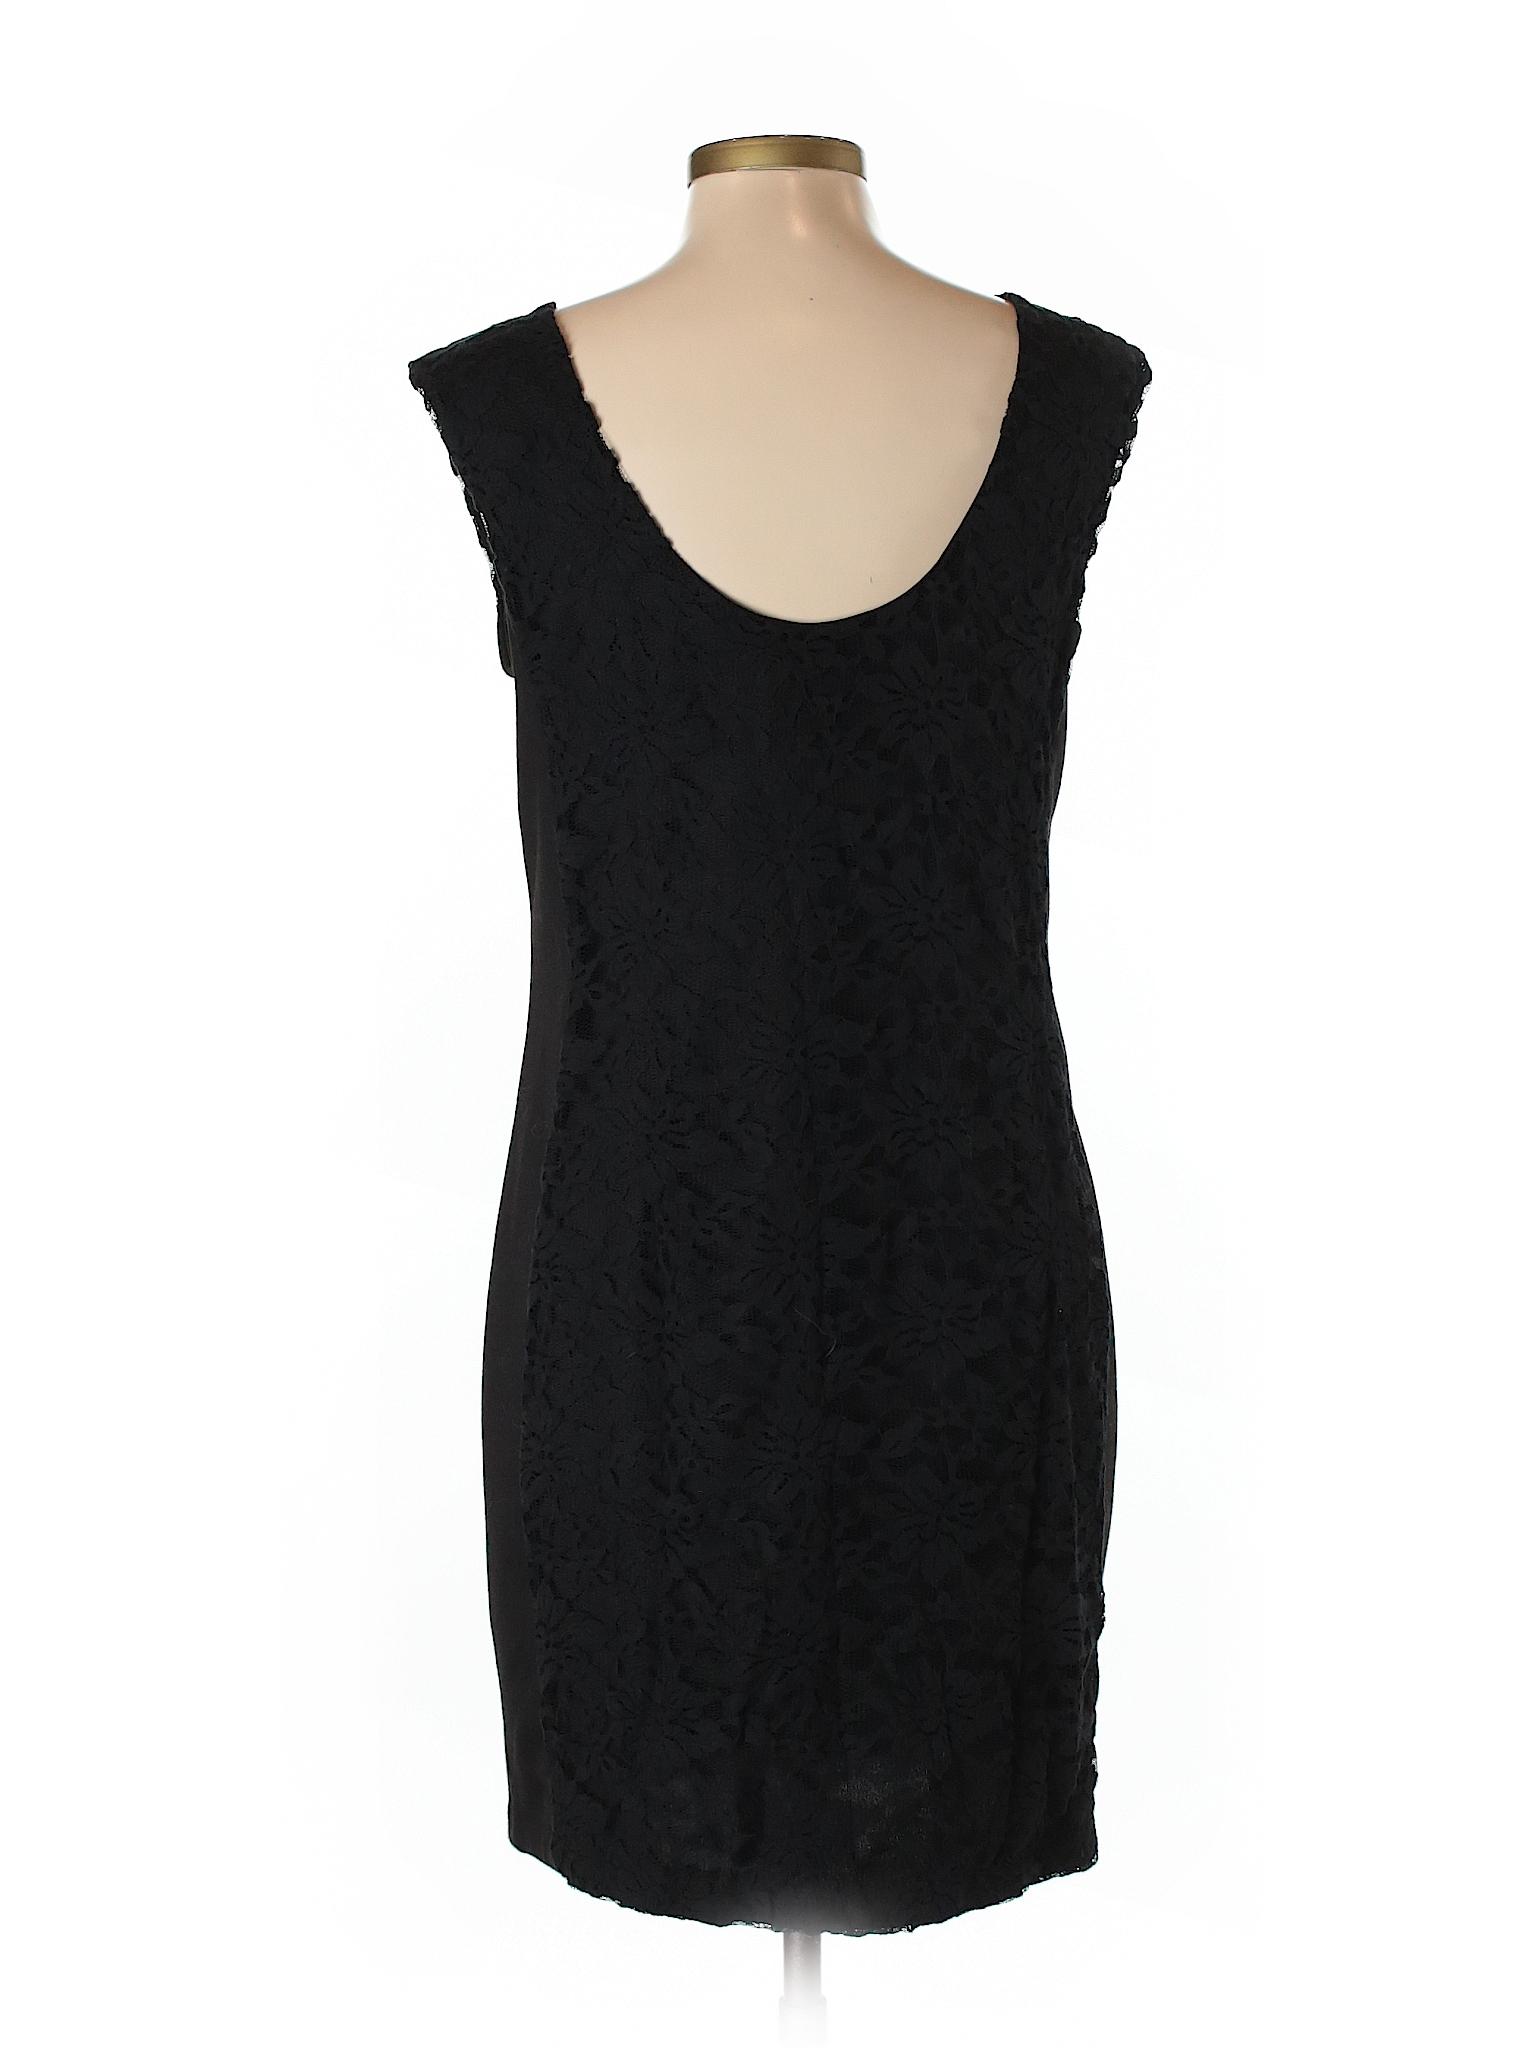 winter Boutique Apt Casual Dress 9 f6w6xpgqd